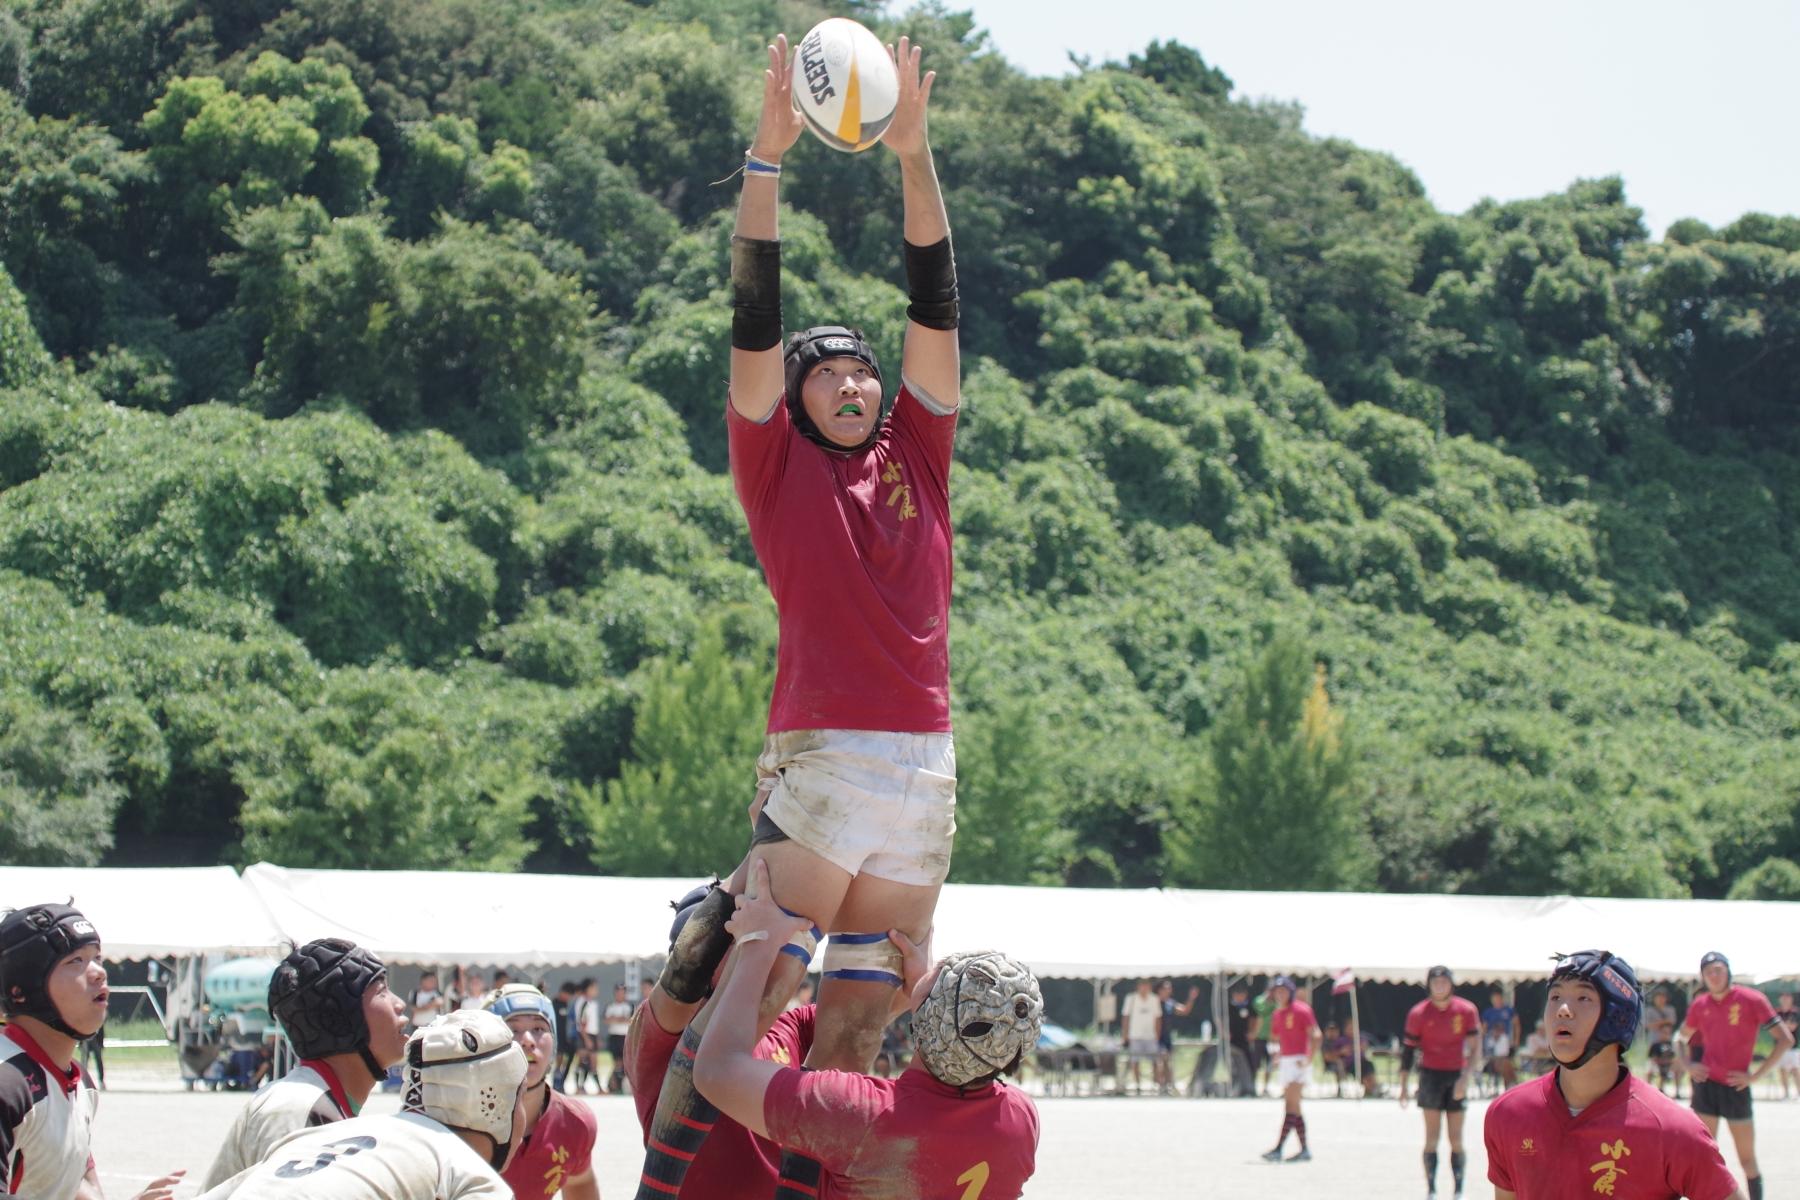 http://kokura-rugby.sakura.ne.jp/180805_132438_0290.jpg